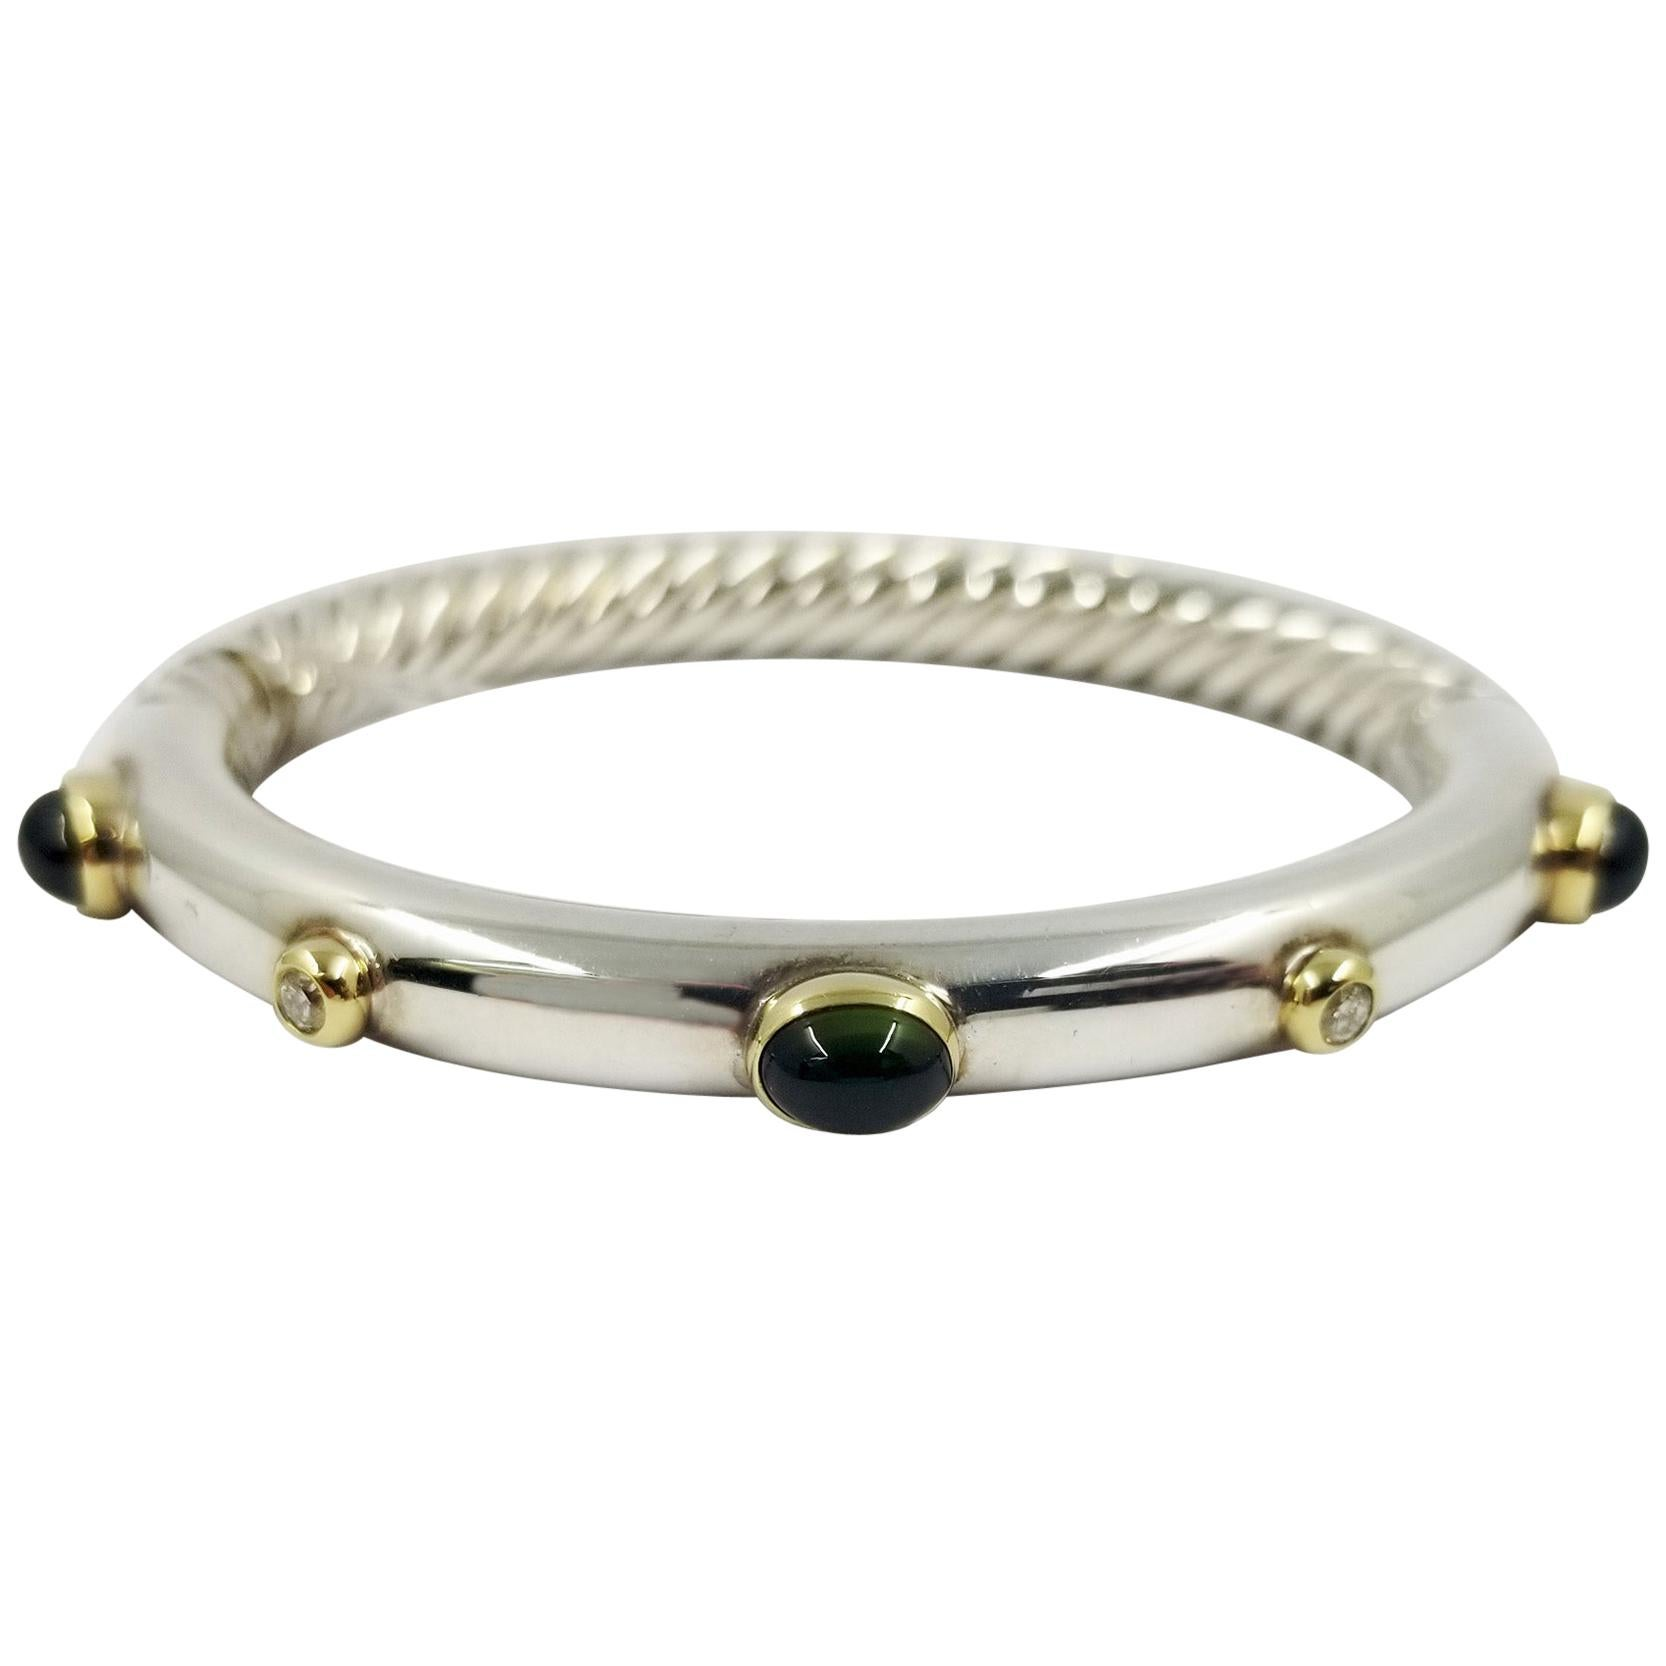 David Yurman Two-Tone Green Tourmaline Cable Bangle Bracelet